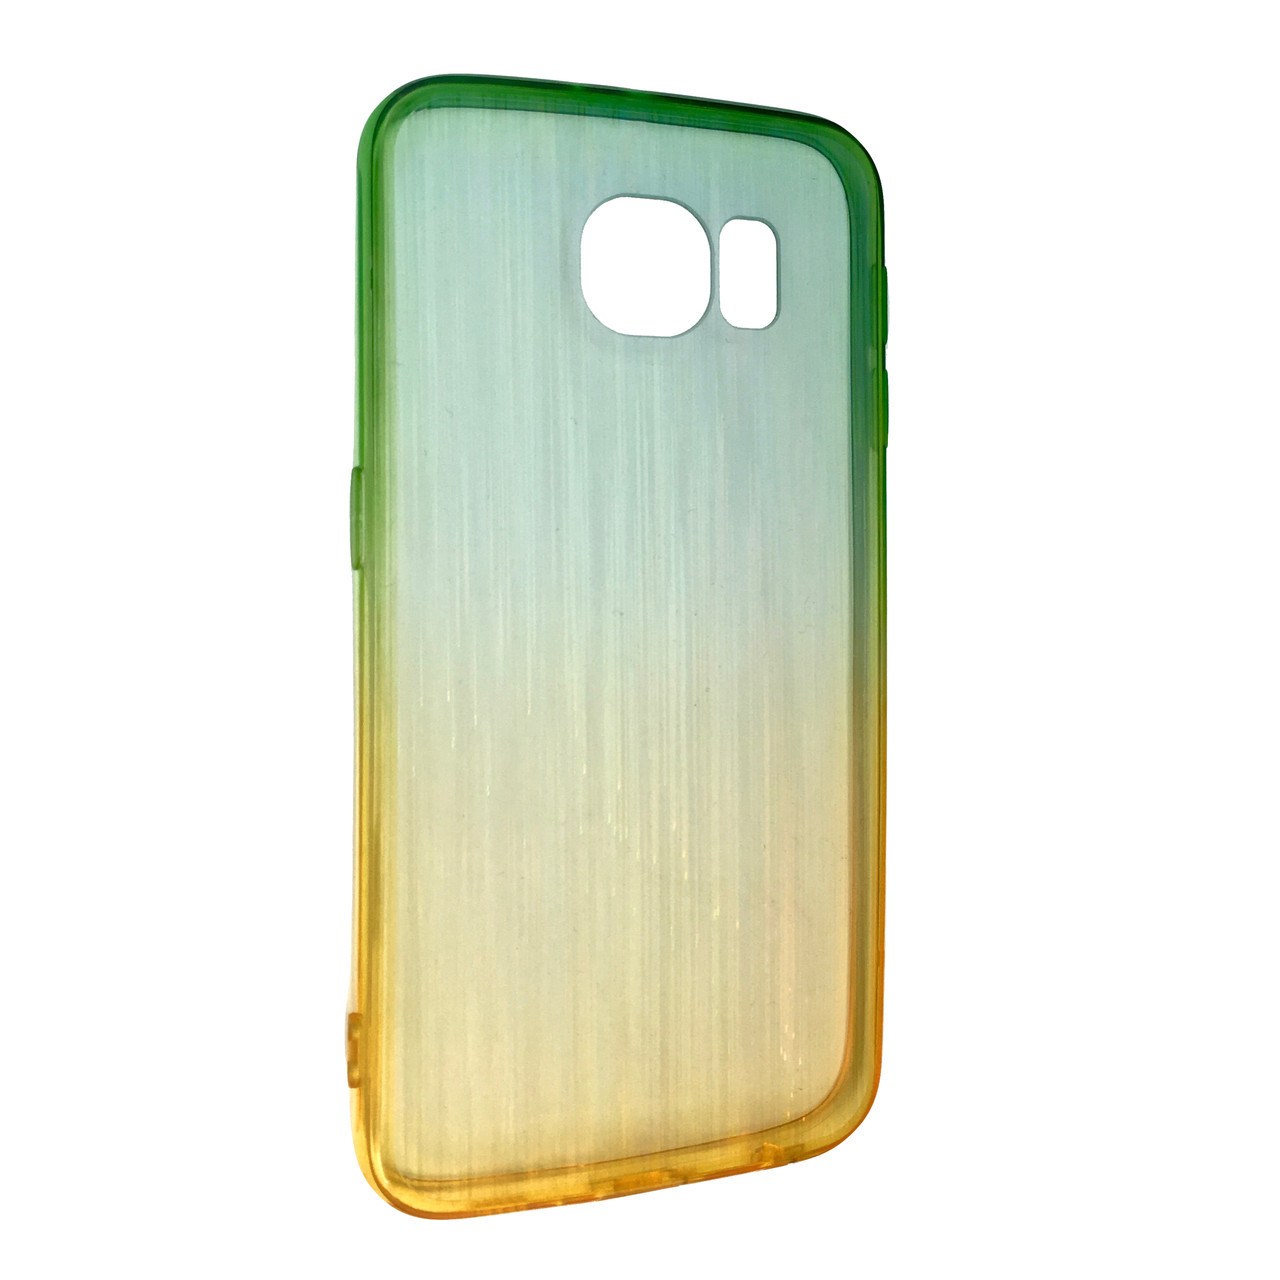 Чехол радуга градиент SAMSUNG S6 (yellow/green)